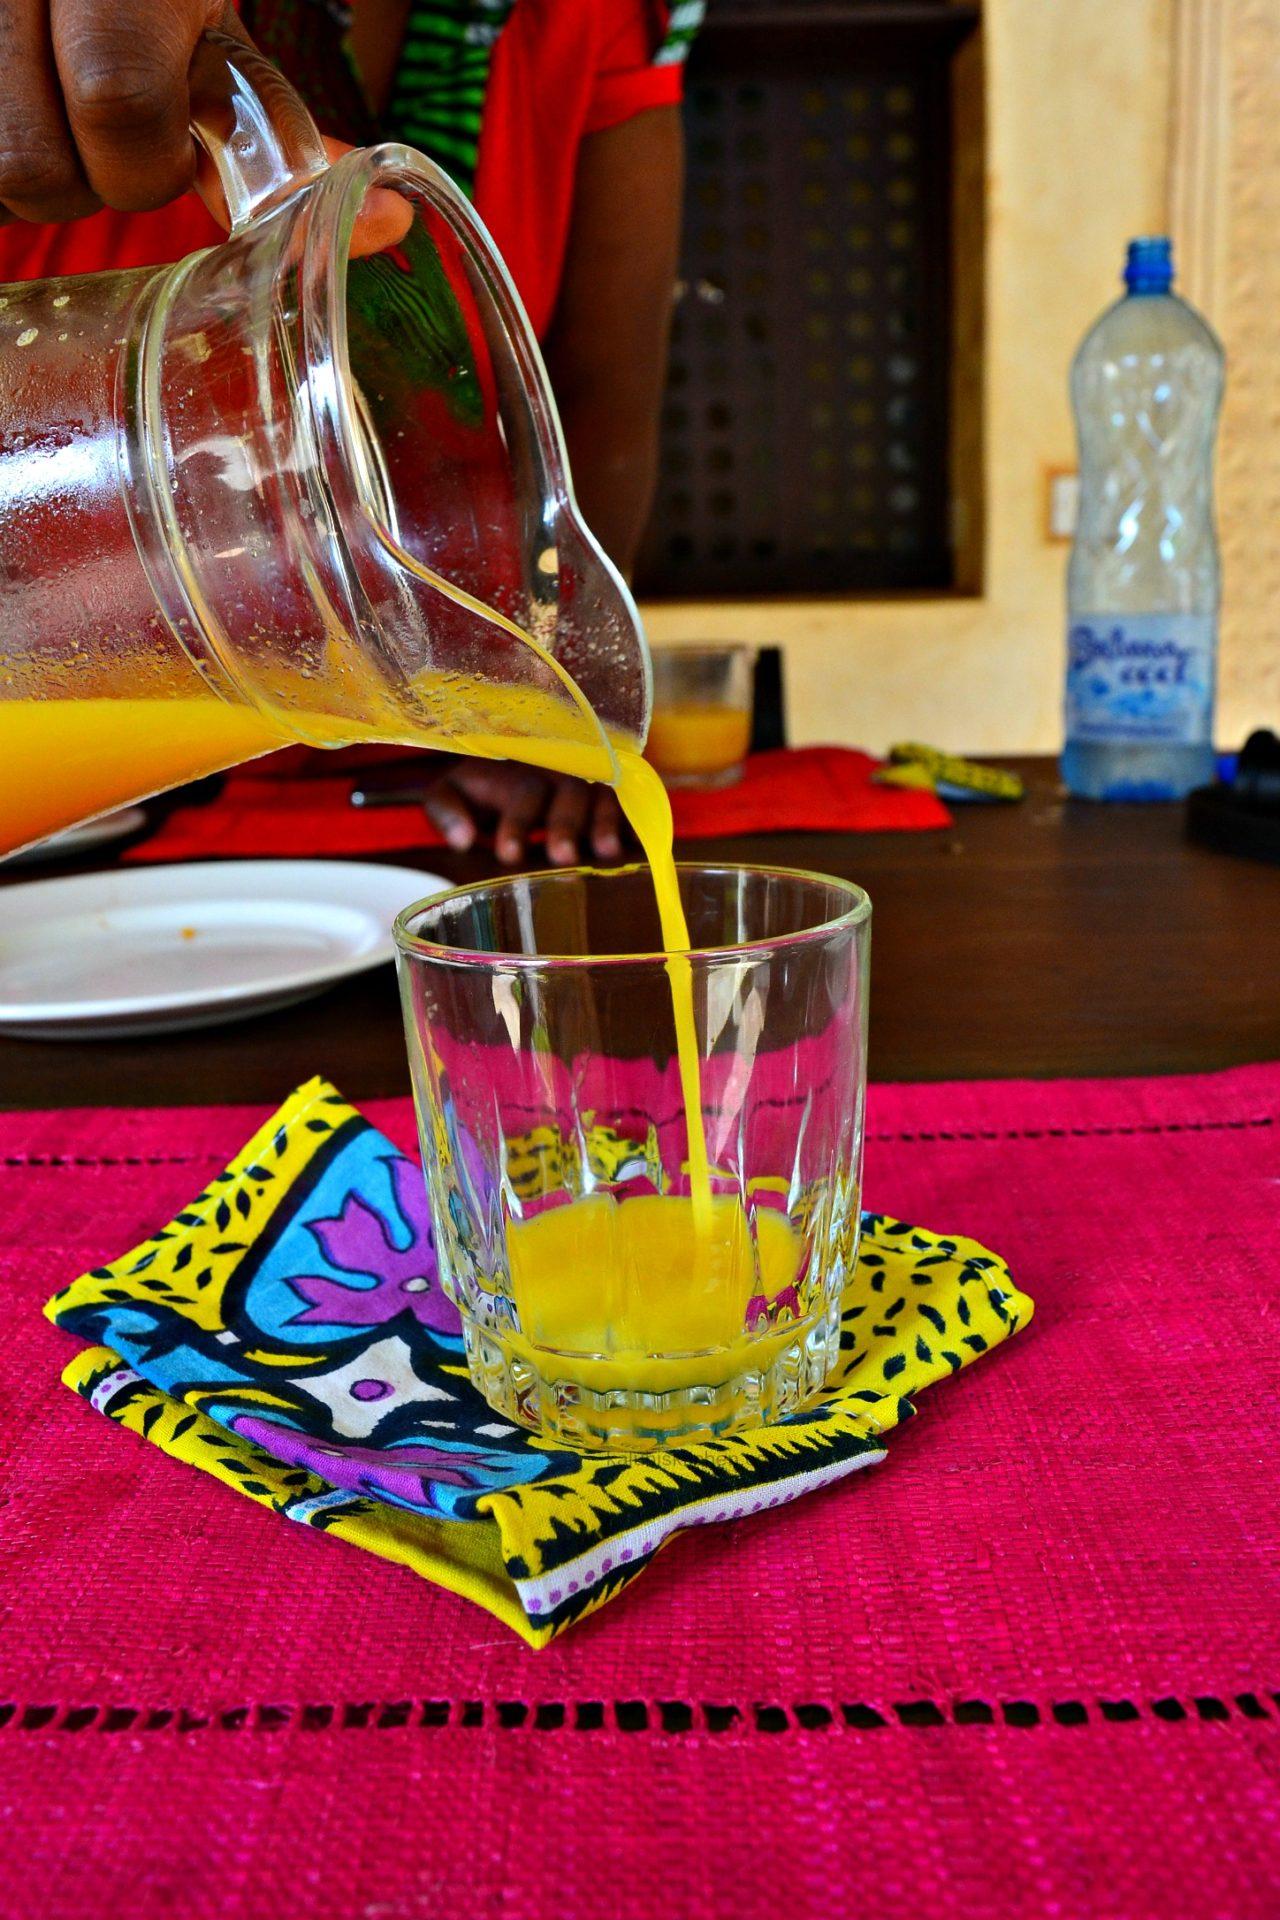 fresh mango juice served at kiwandani house as part of the breakfast_affordable accomodation at Lamu_Lamu Food Festival